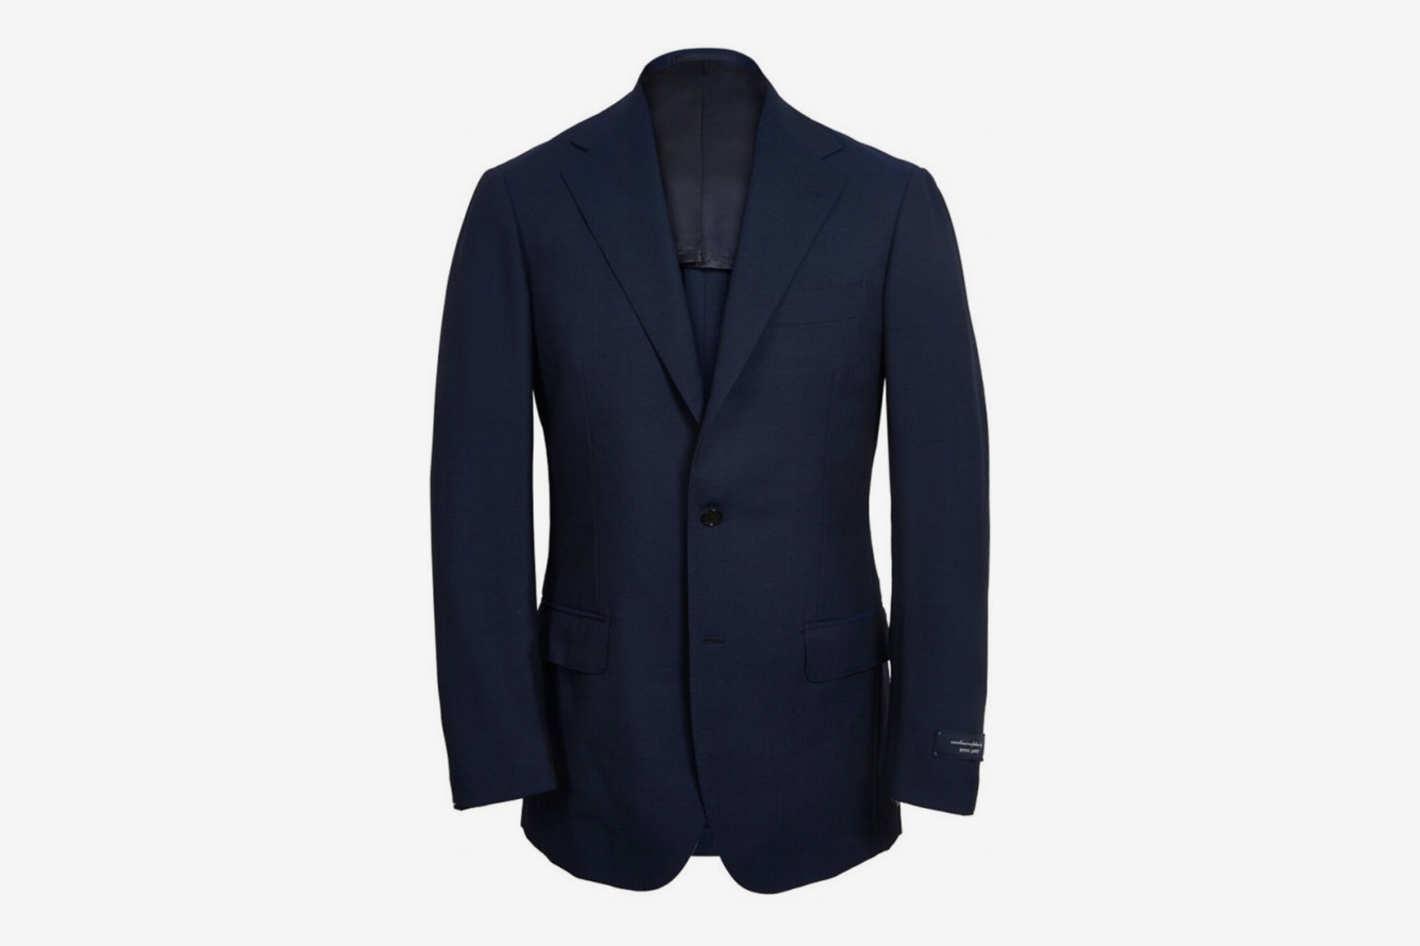 Ring Jacket Navy Calm Twist Wool Suit